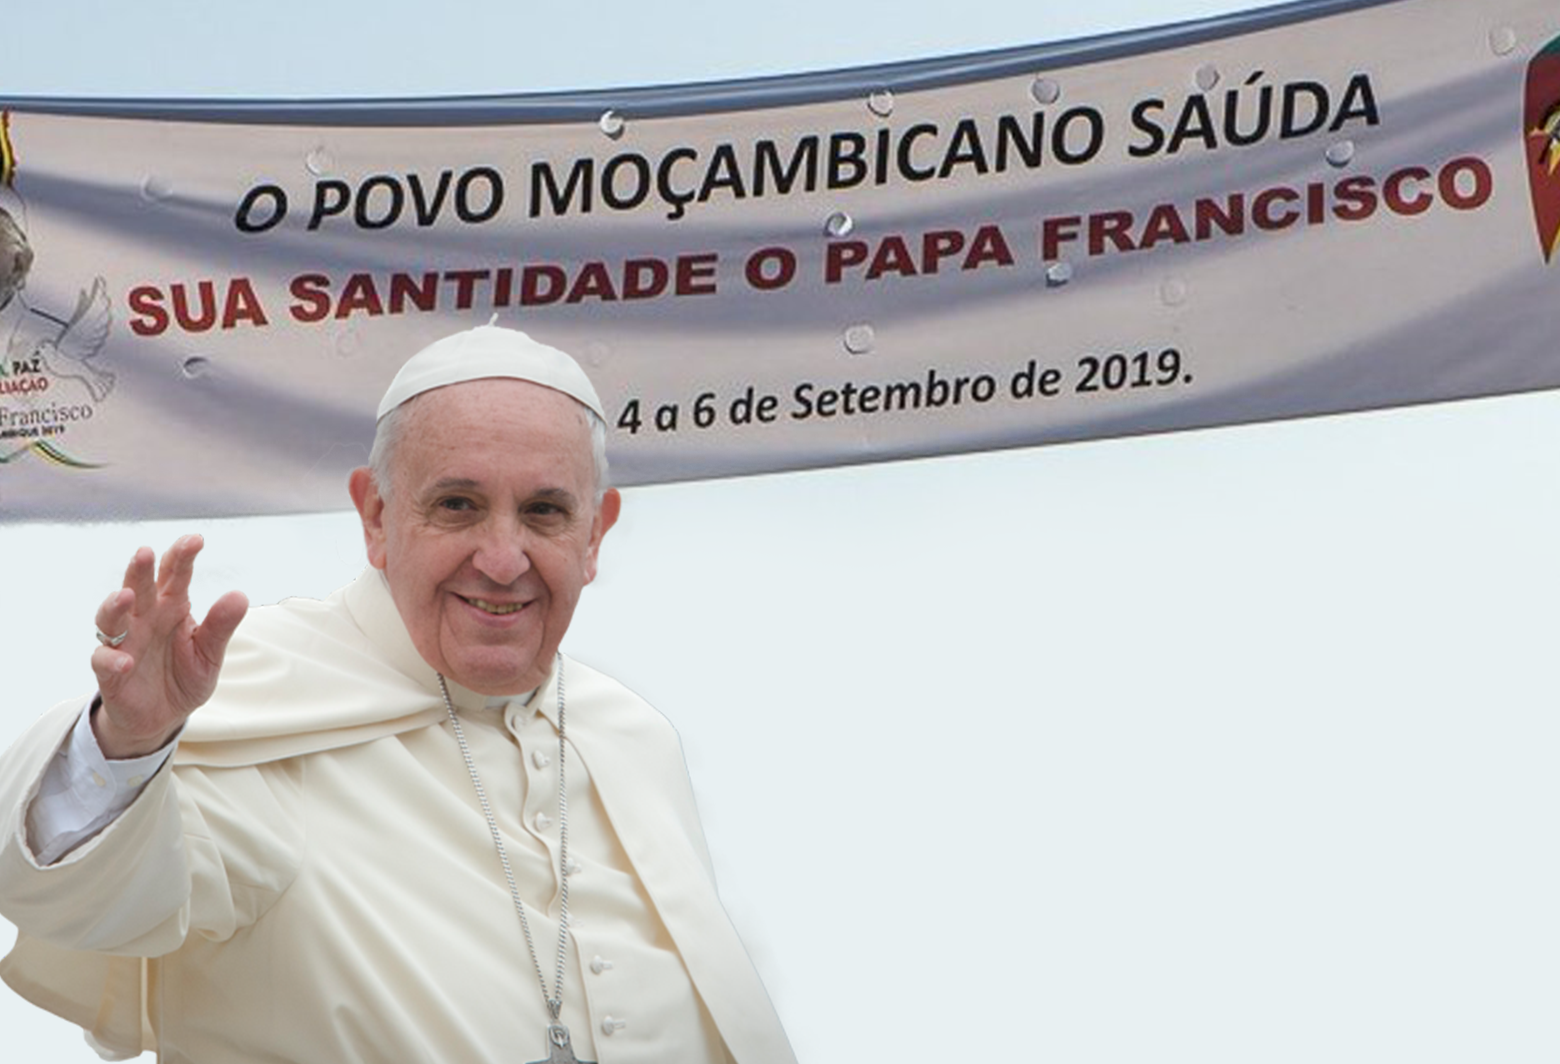 Mozambico, Papa Francesco: Basta Saccheggiare L'Africa. Difesa Terra è Difesa Vita